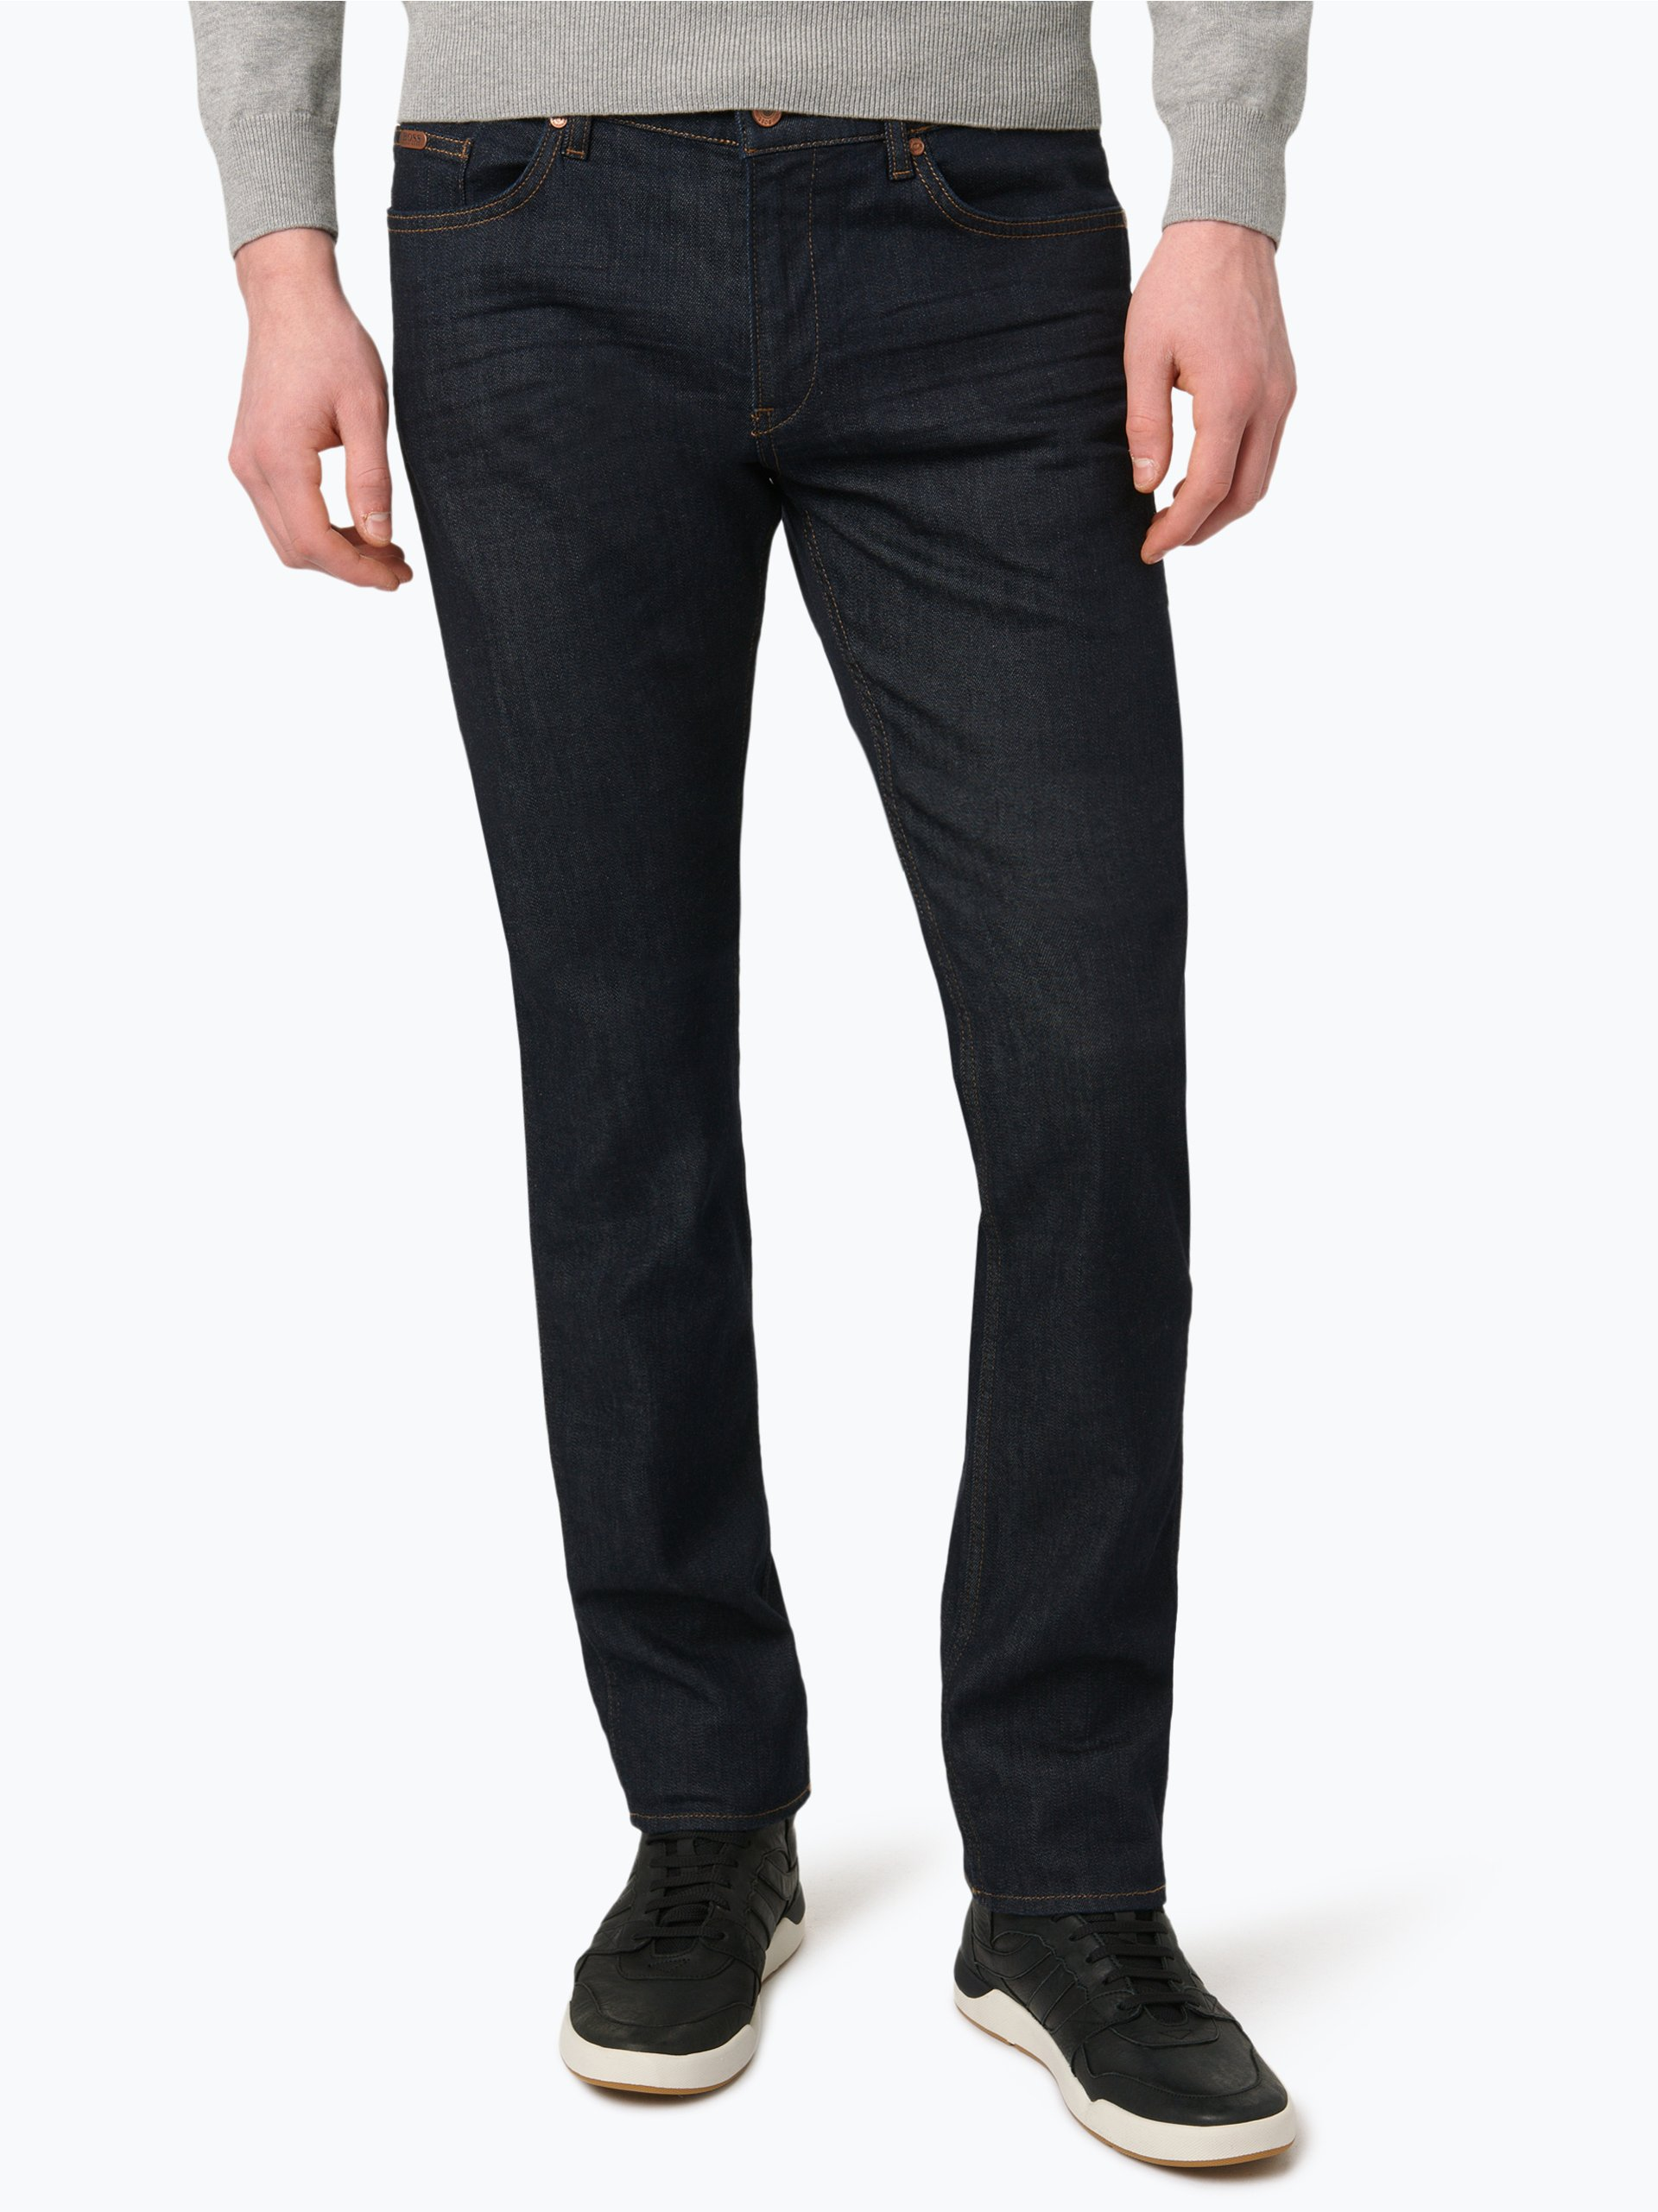 boss green herren jeans c delaware1 rinsed uni online kaufen vangraaf com. Black Bedroom Furniture Sets. Home Design Ideas